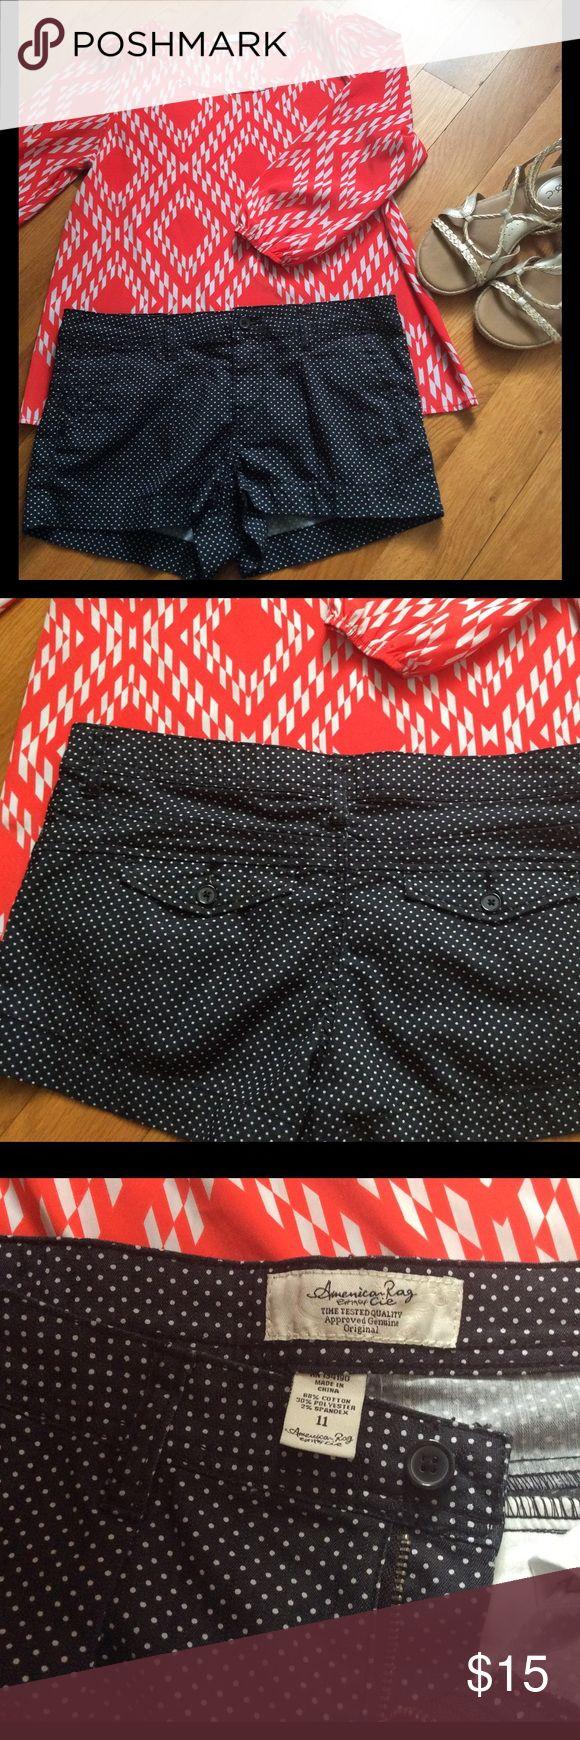 American Rag Jean shorts polka dots size 11 American Rag Jean shorts polka dots size 11 dark dark blue 2% spandex American Rag Shorts Jean Shorts